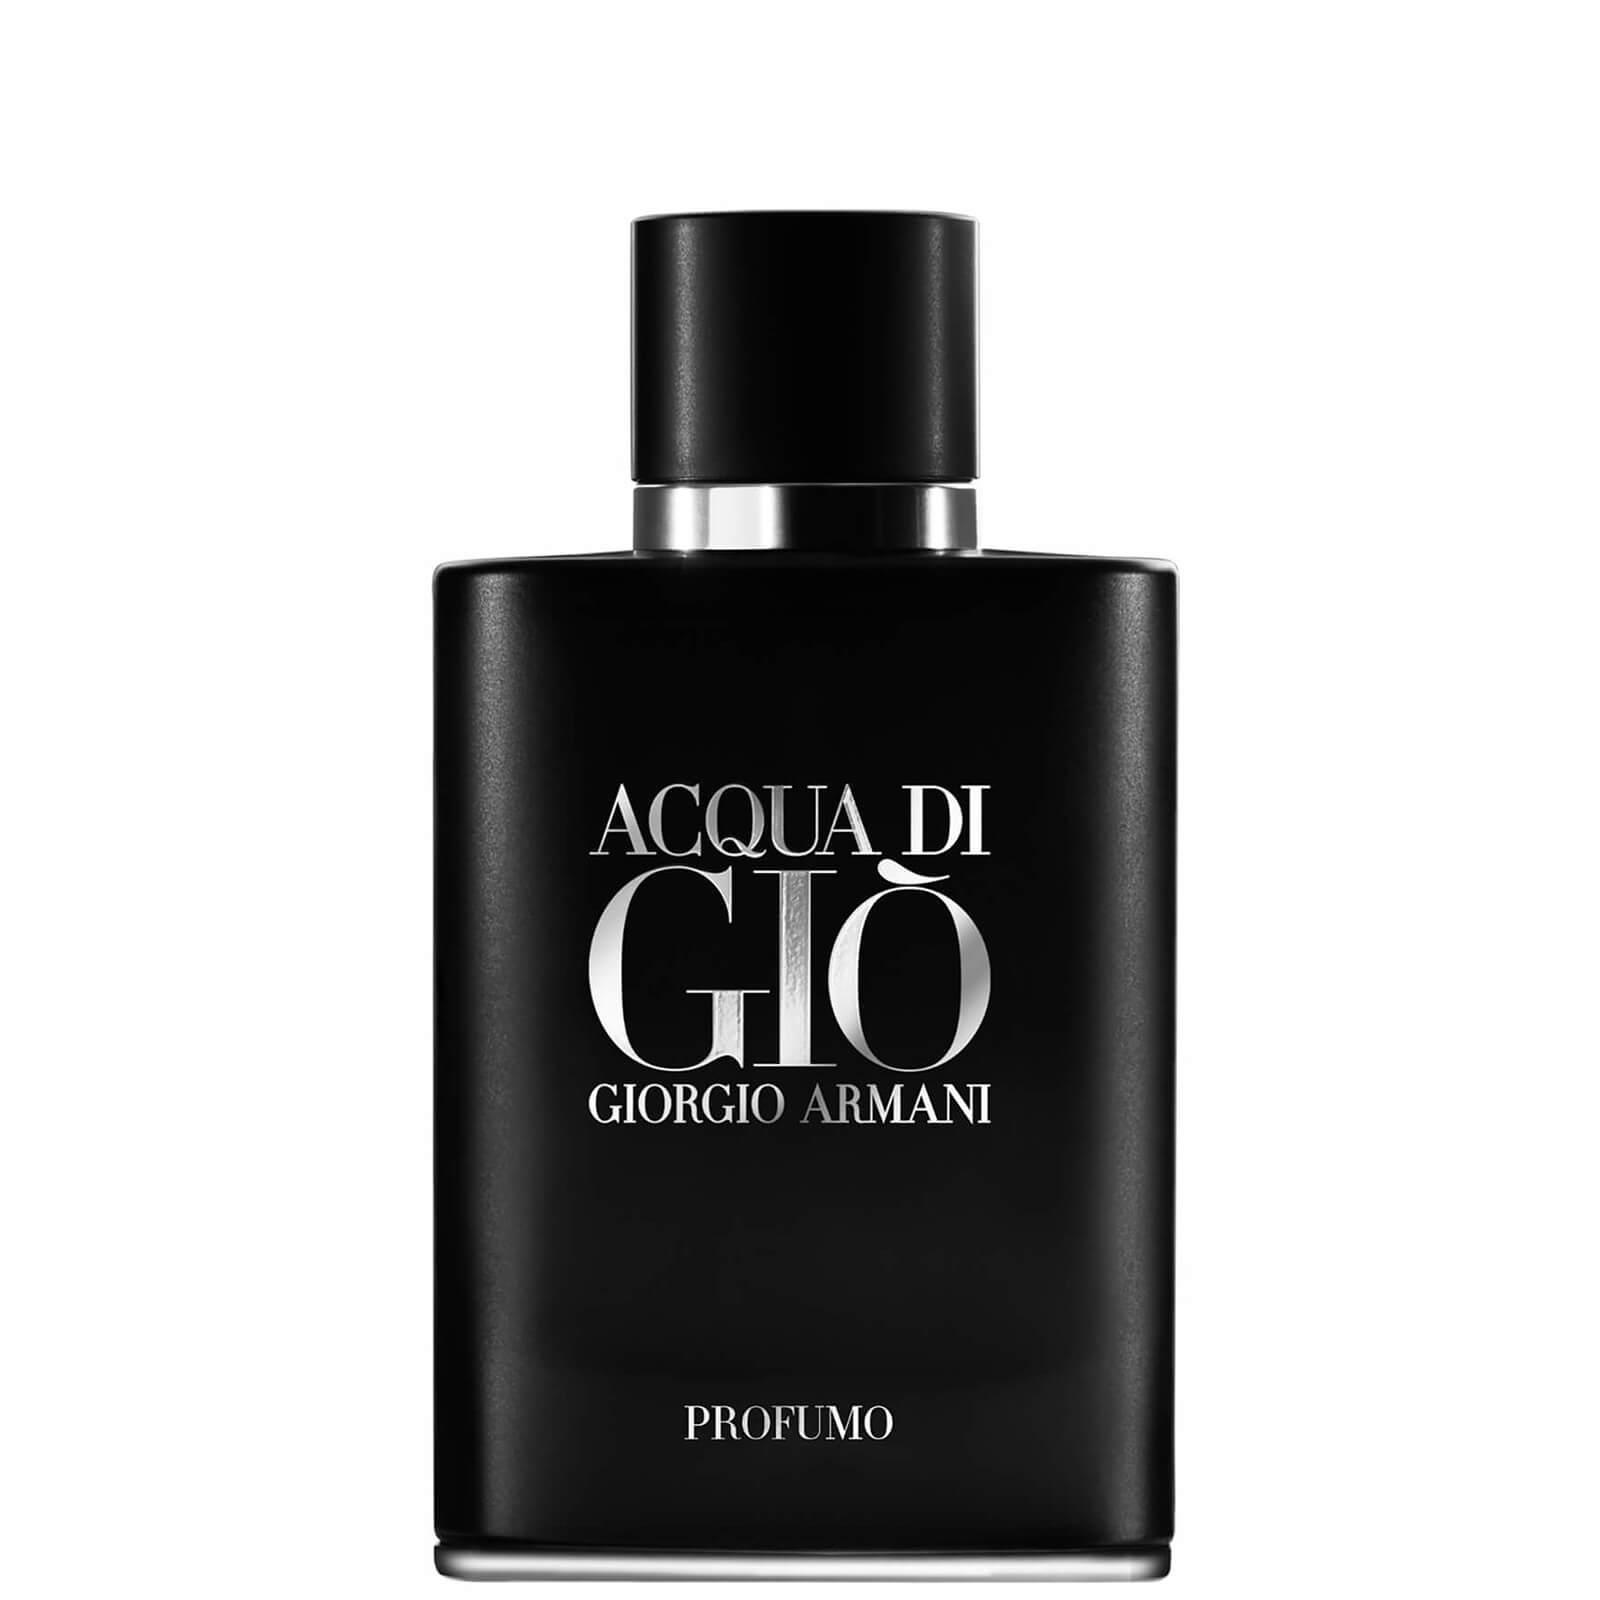 Image of Armani Acqua Di Gio Homme Profumo Eau de Parfum (Various Sizes) - 75ml